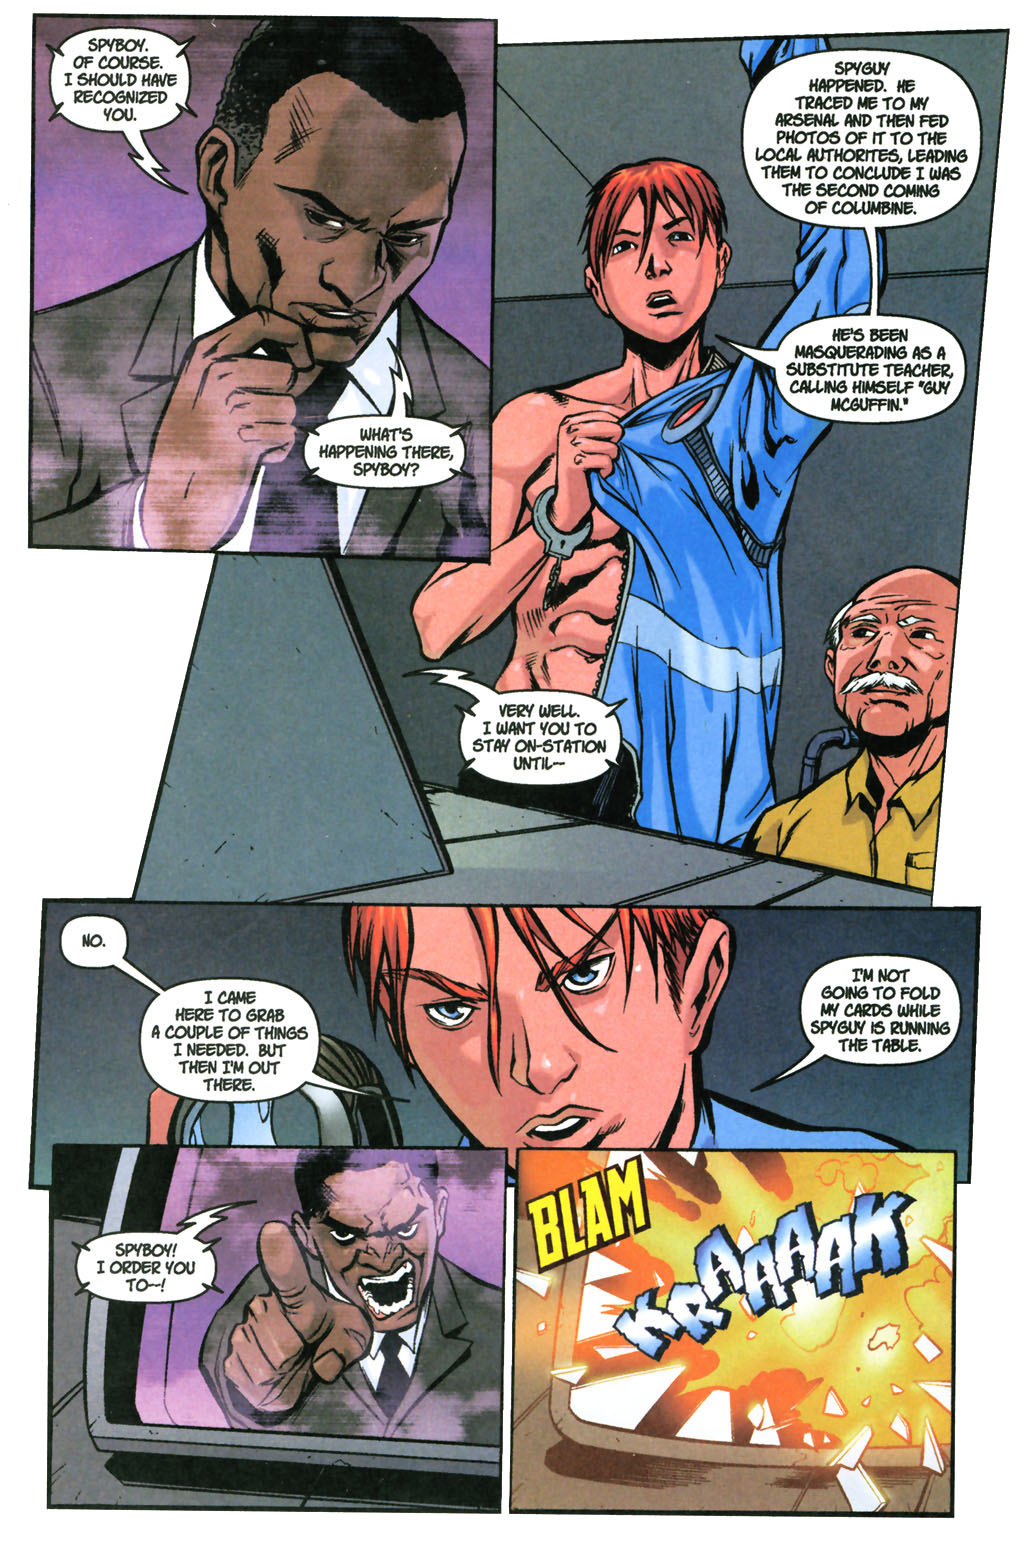 Read online SpyBoy: Final Exam comic -  Issue #3 - 16